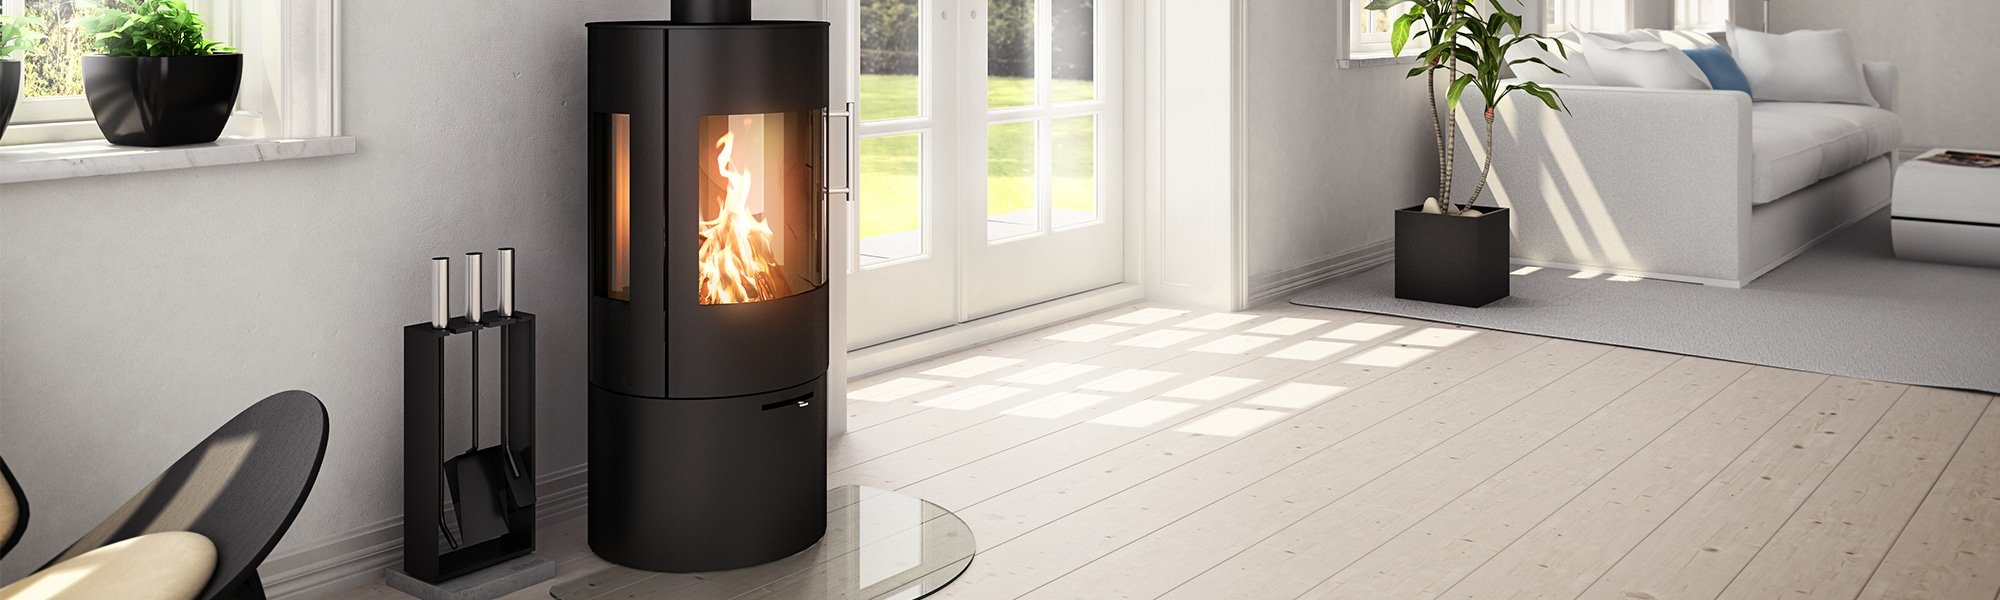 zigis fireplaces premier retailer of gas u0026 electric fires in essex